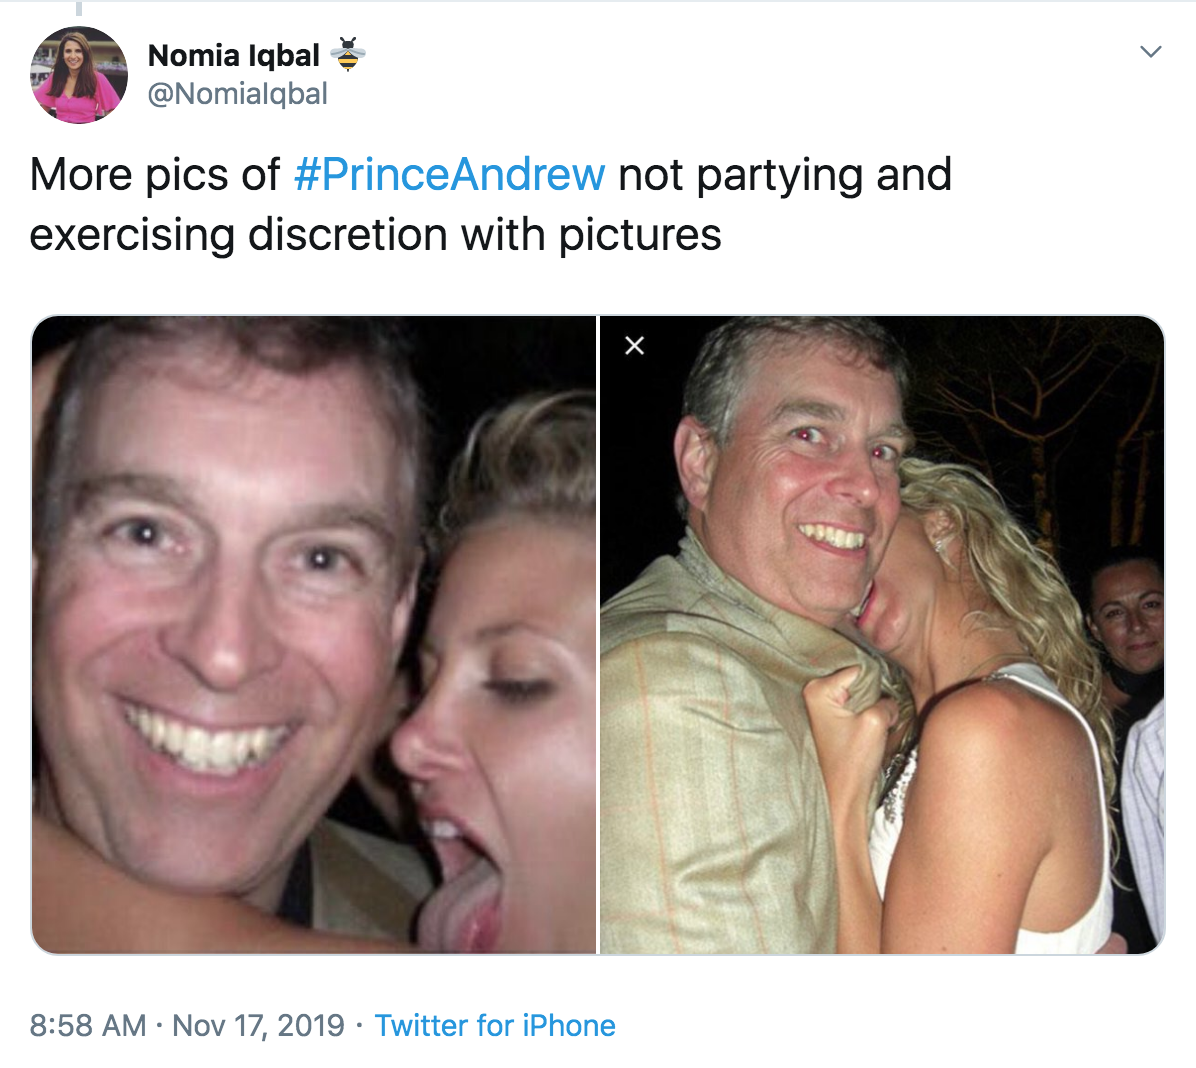 Prince Andrew tweet